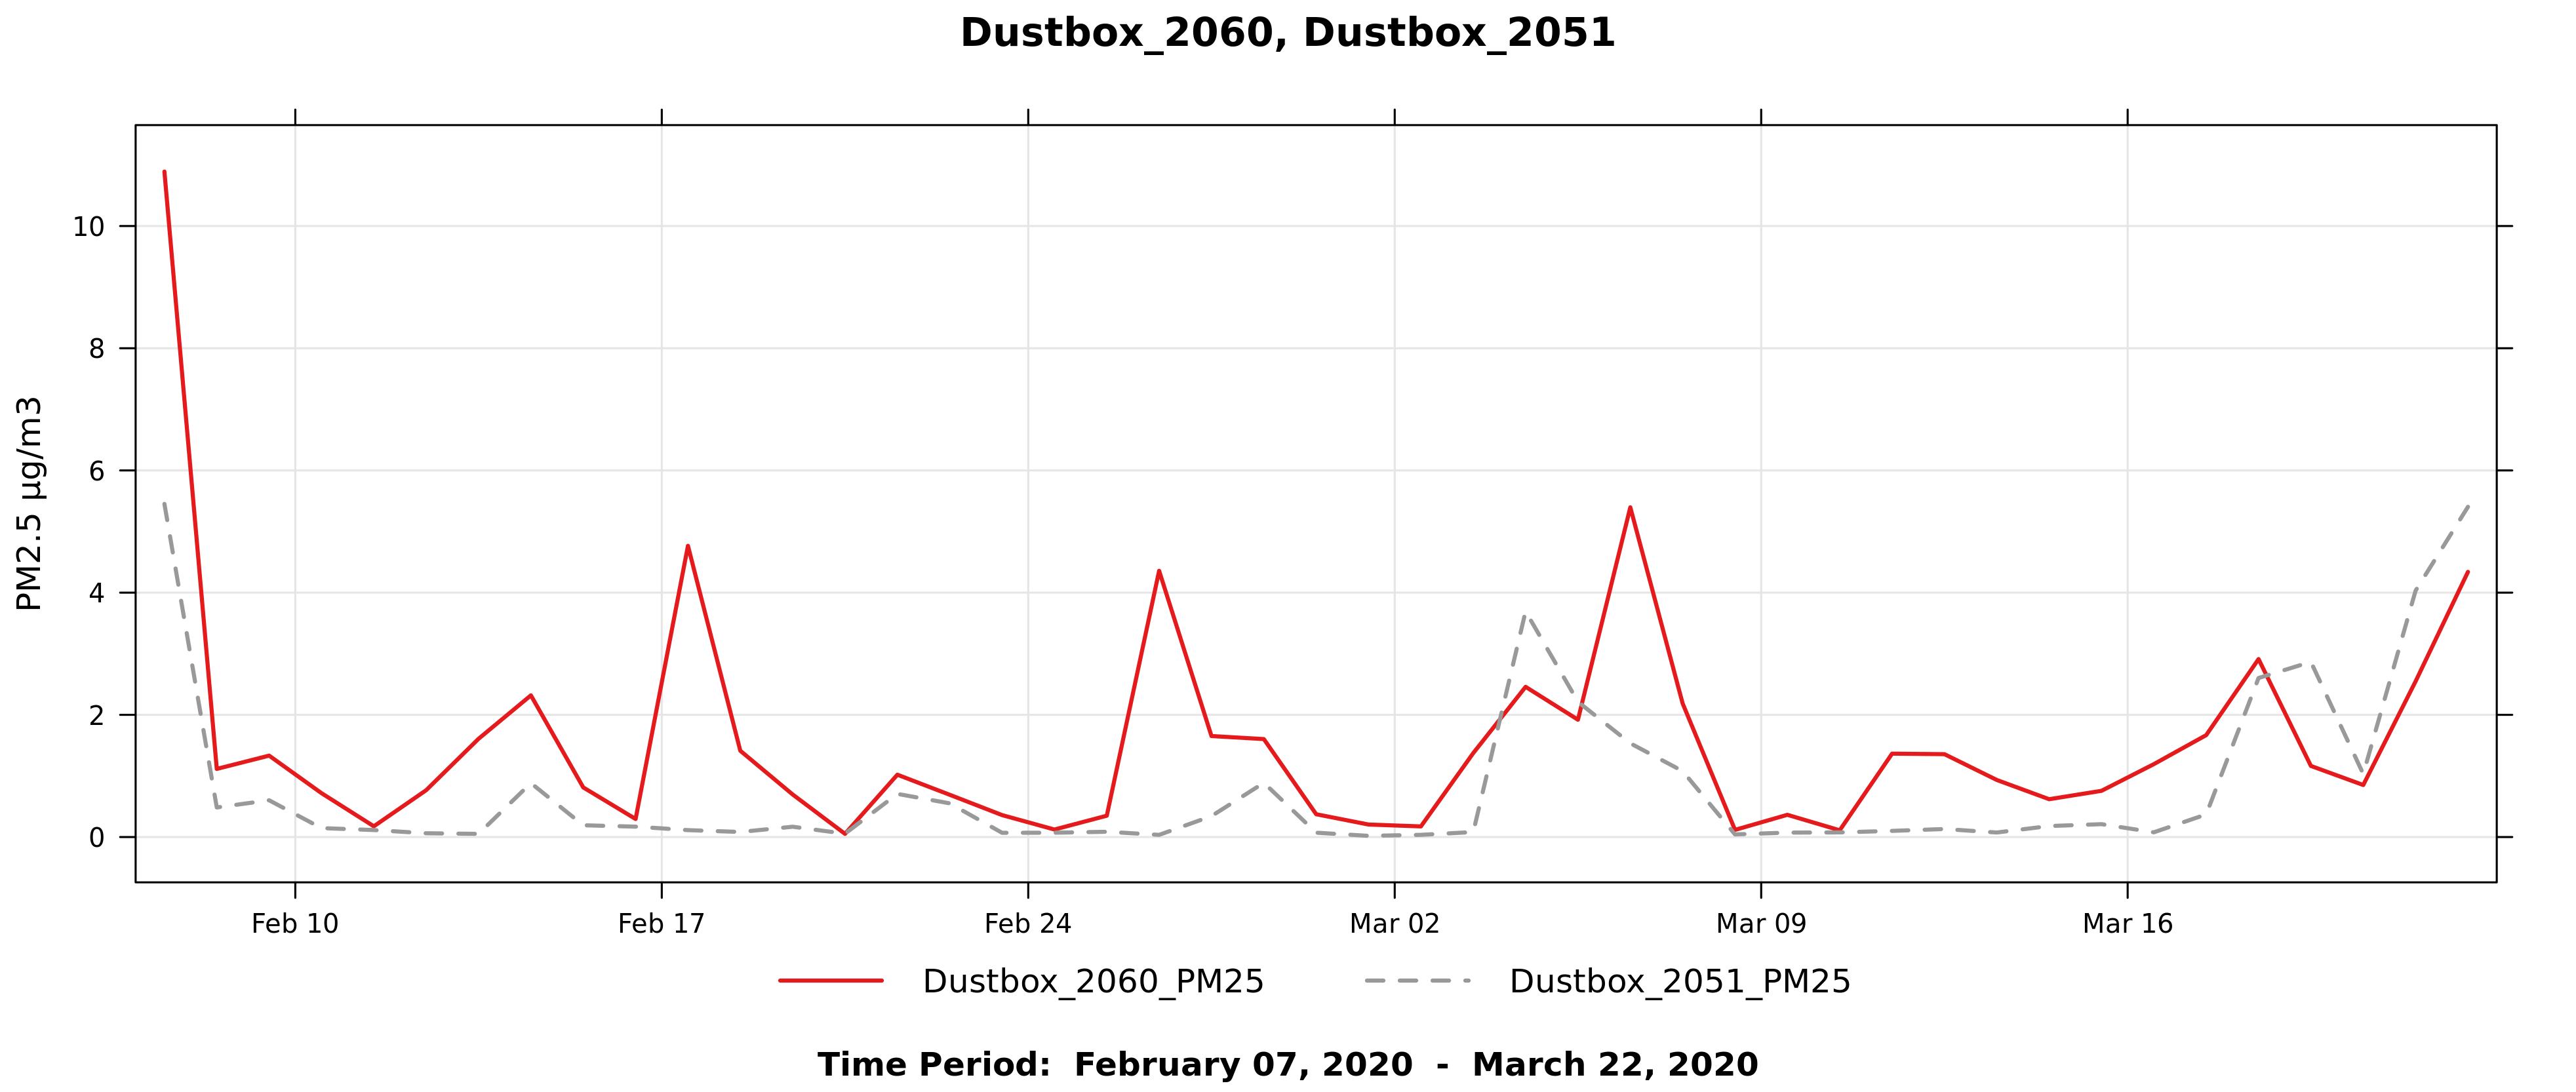 Figure3a_Dustbox2060_2051_DailyLineGraphPreLockdown